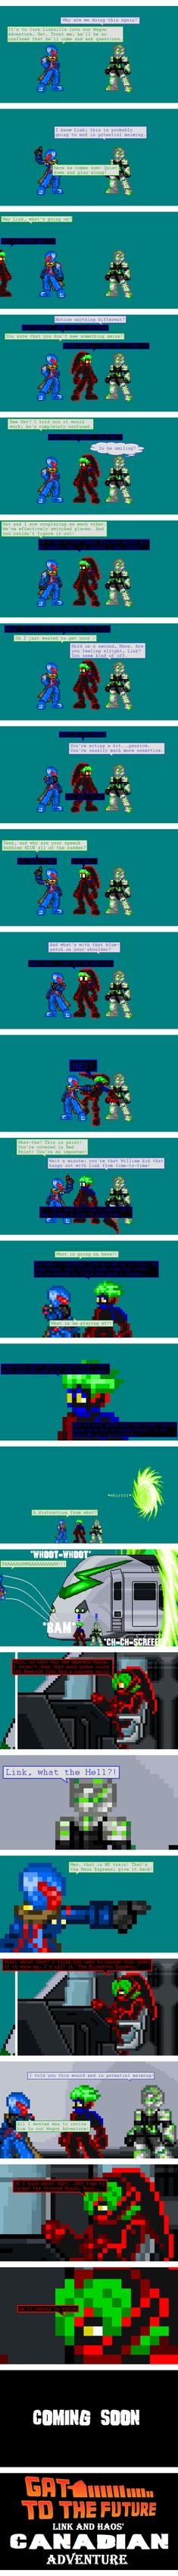 Cosplay Response by Linkzilla